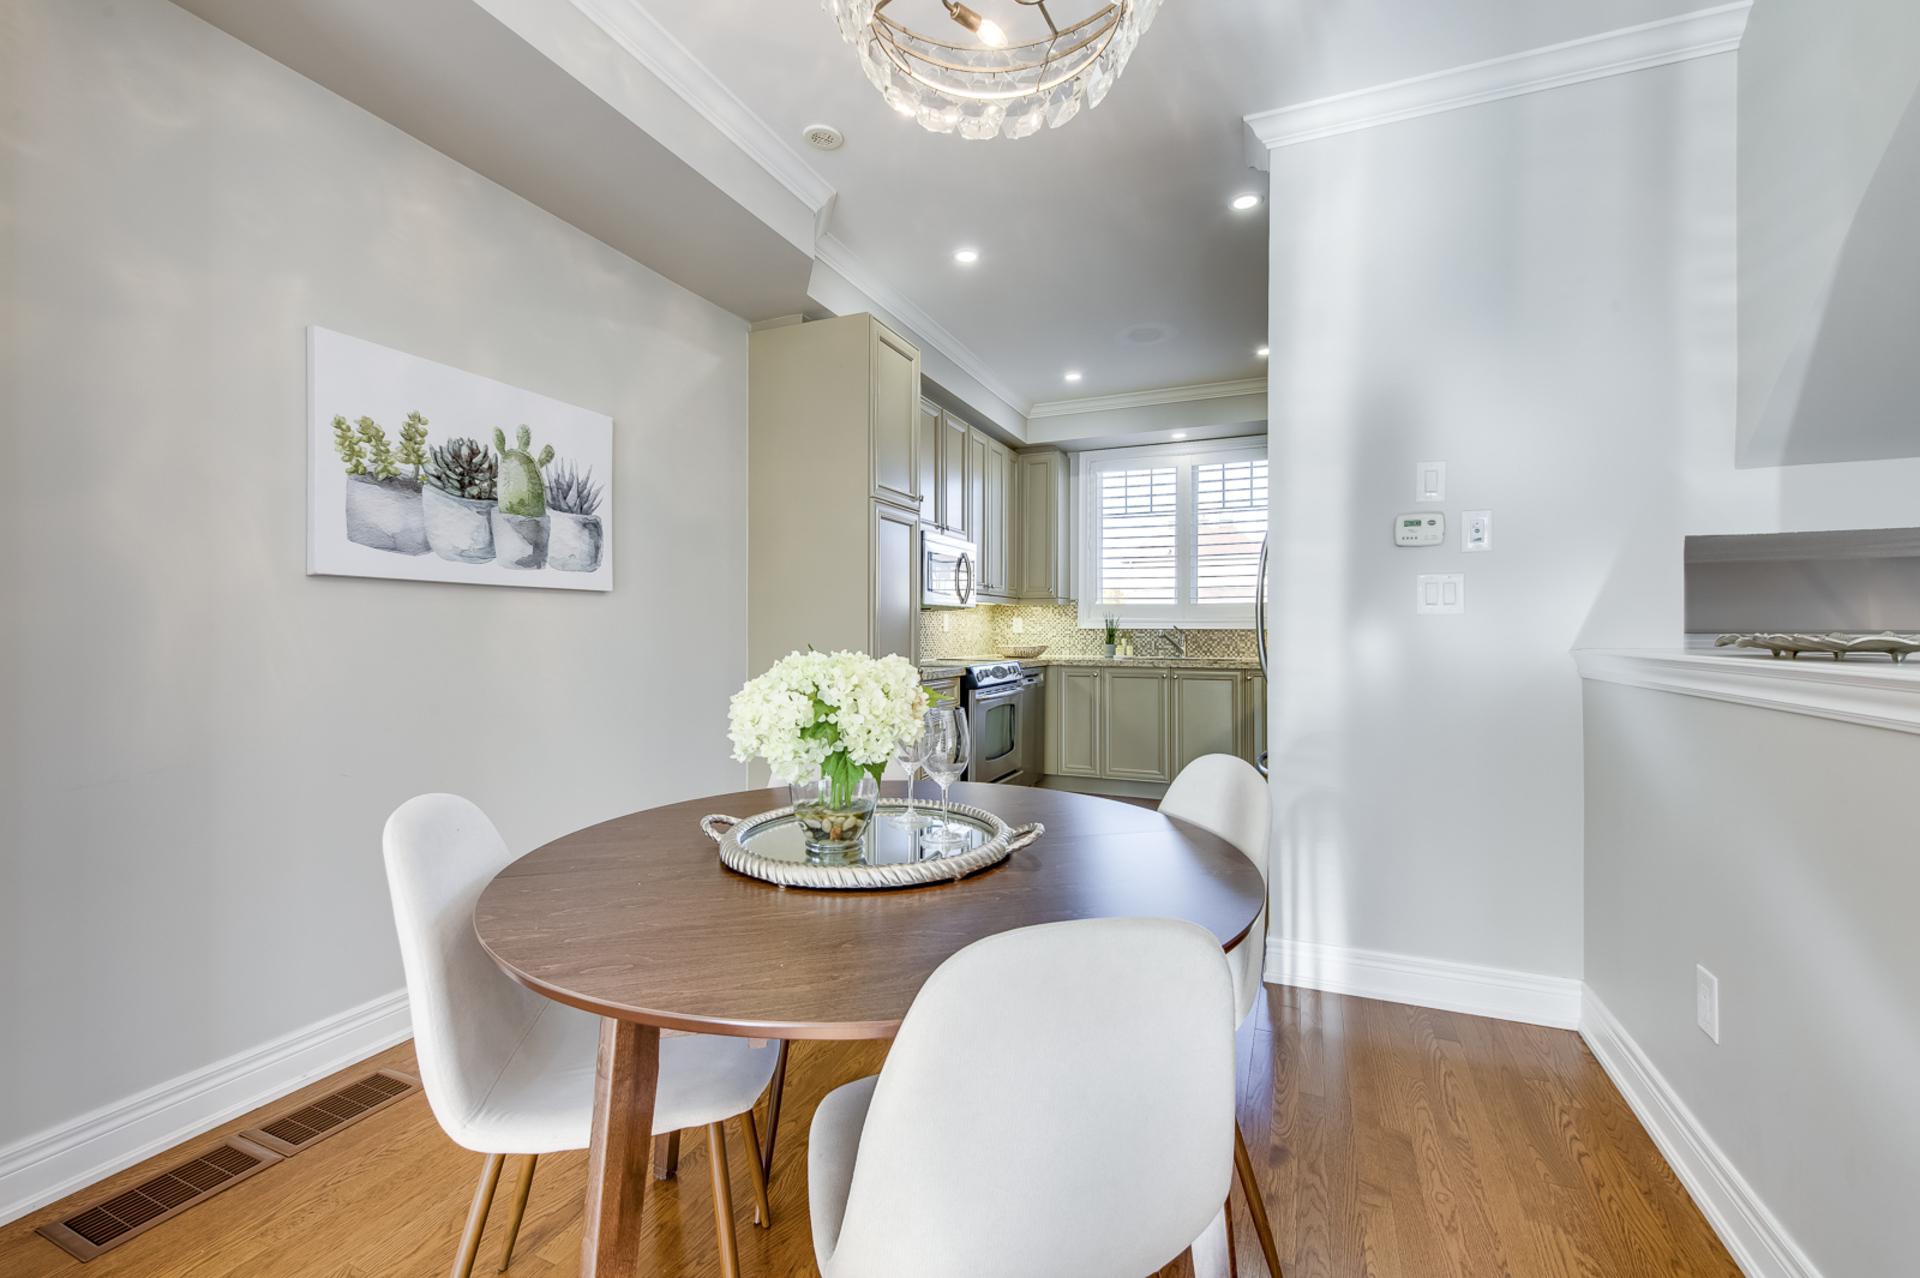 Dining Room - 2014 Lushes Ave, Mississauga - Elite3 & Team at 2014 Lushes Avenue, Clarkson, Mississauga